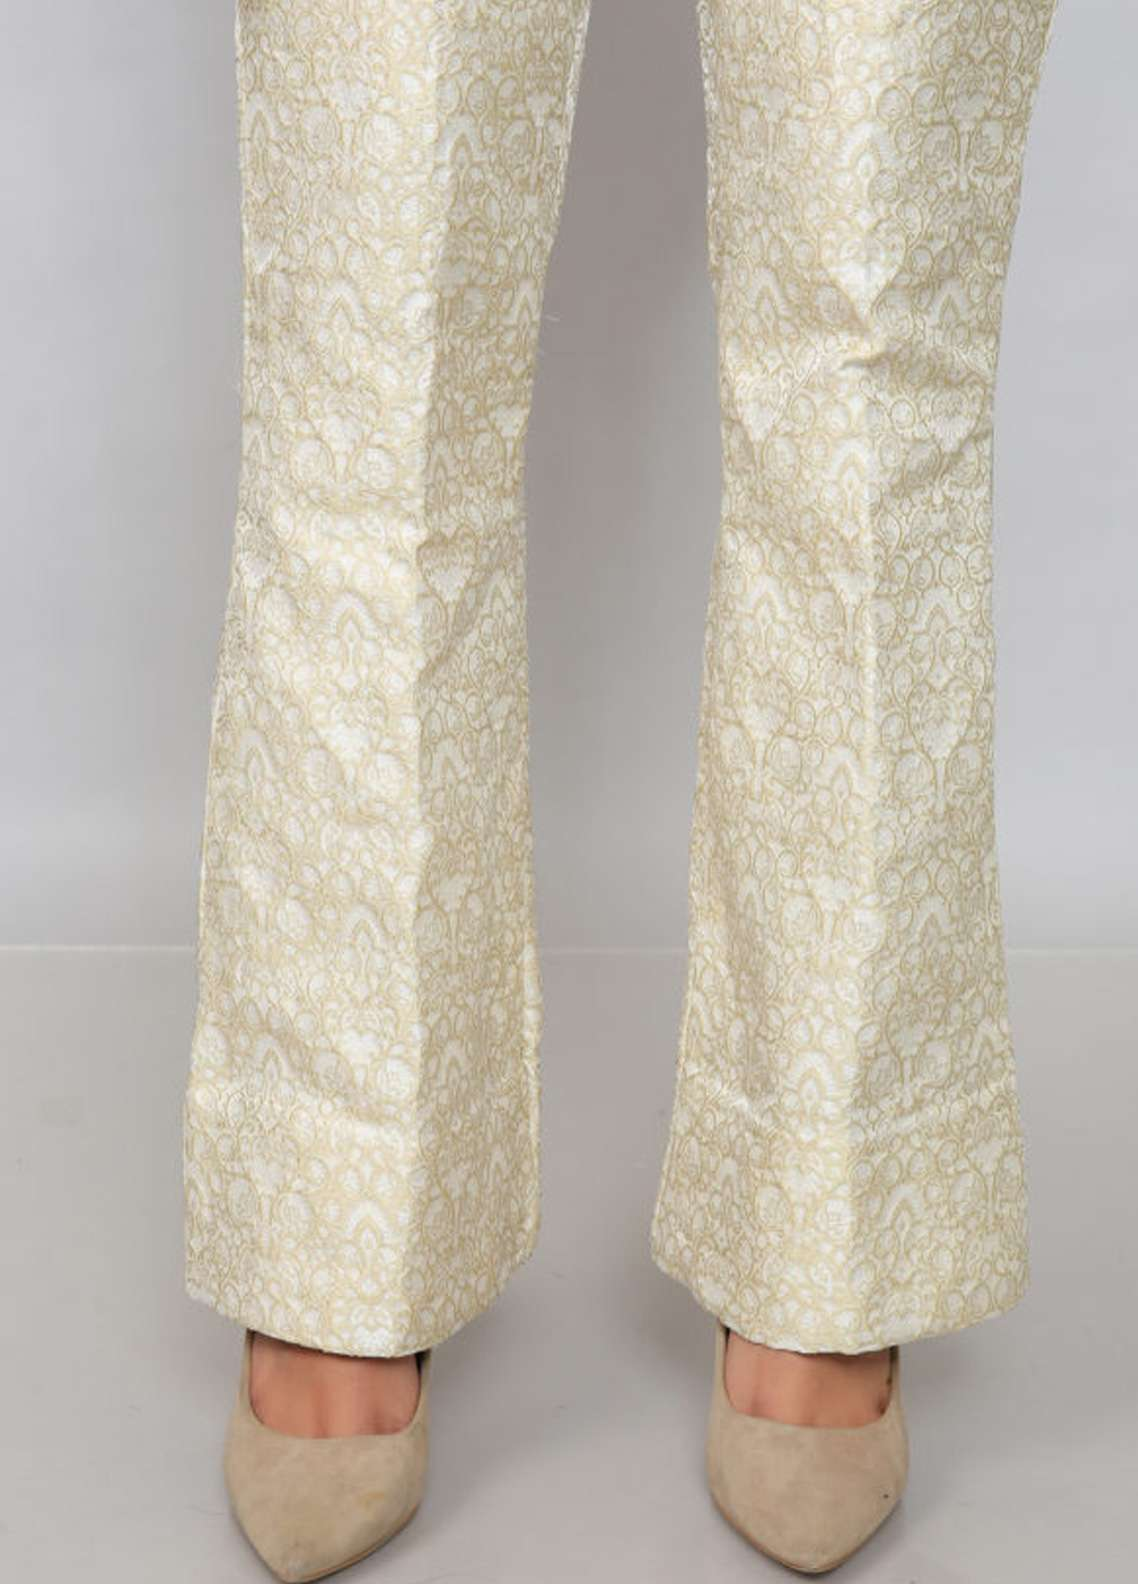 Kross Kulture Textured Jamawar Stitched Trousers EXTR-198026 B Cream